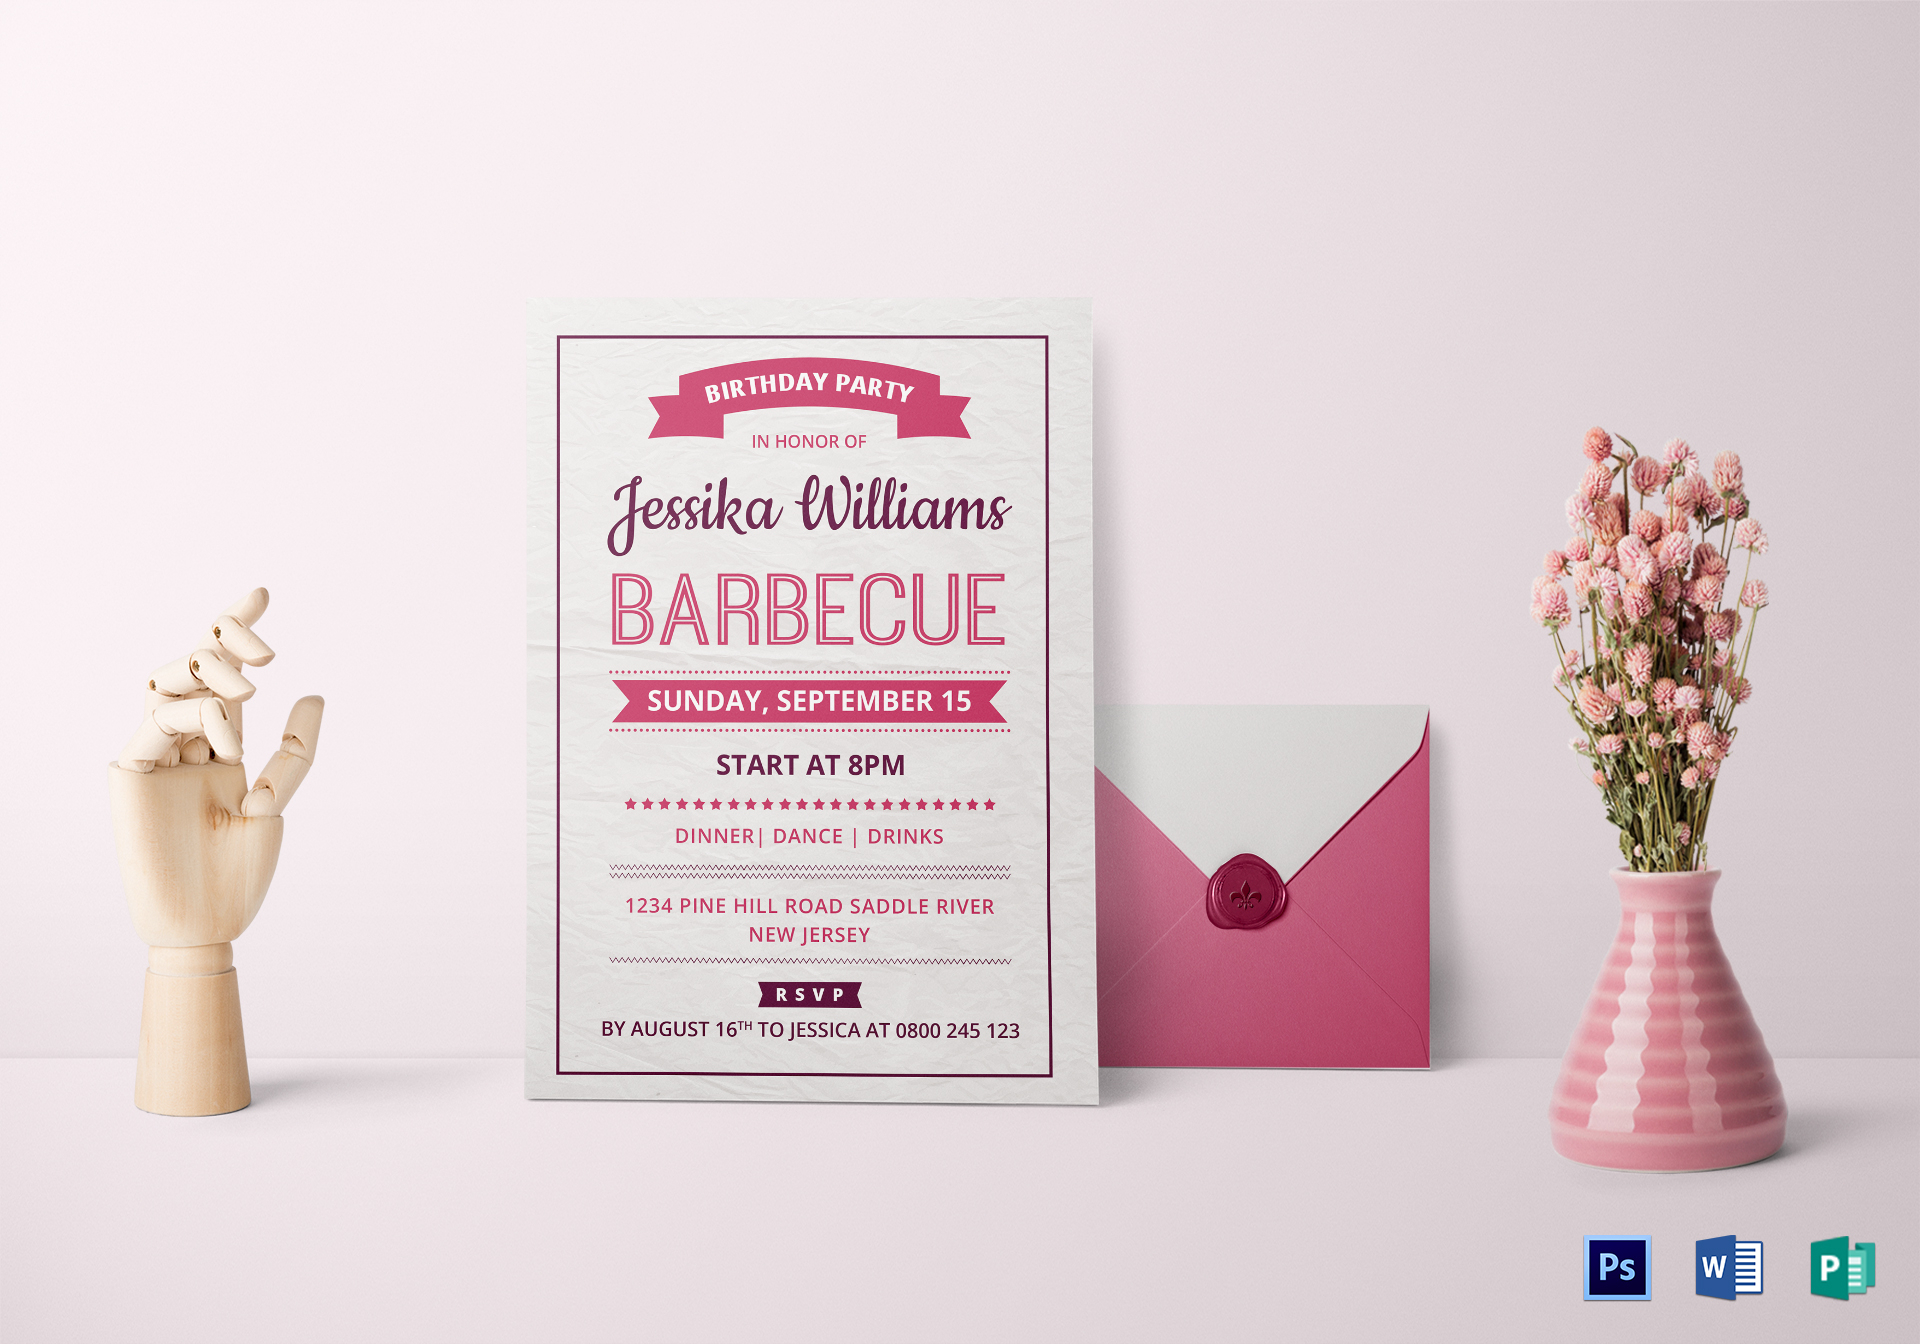 bbq birthday party invitation card